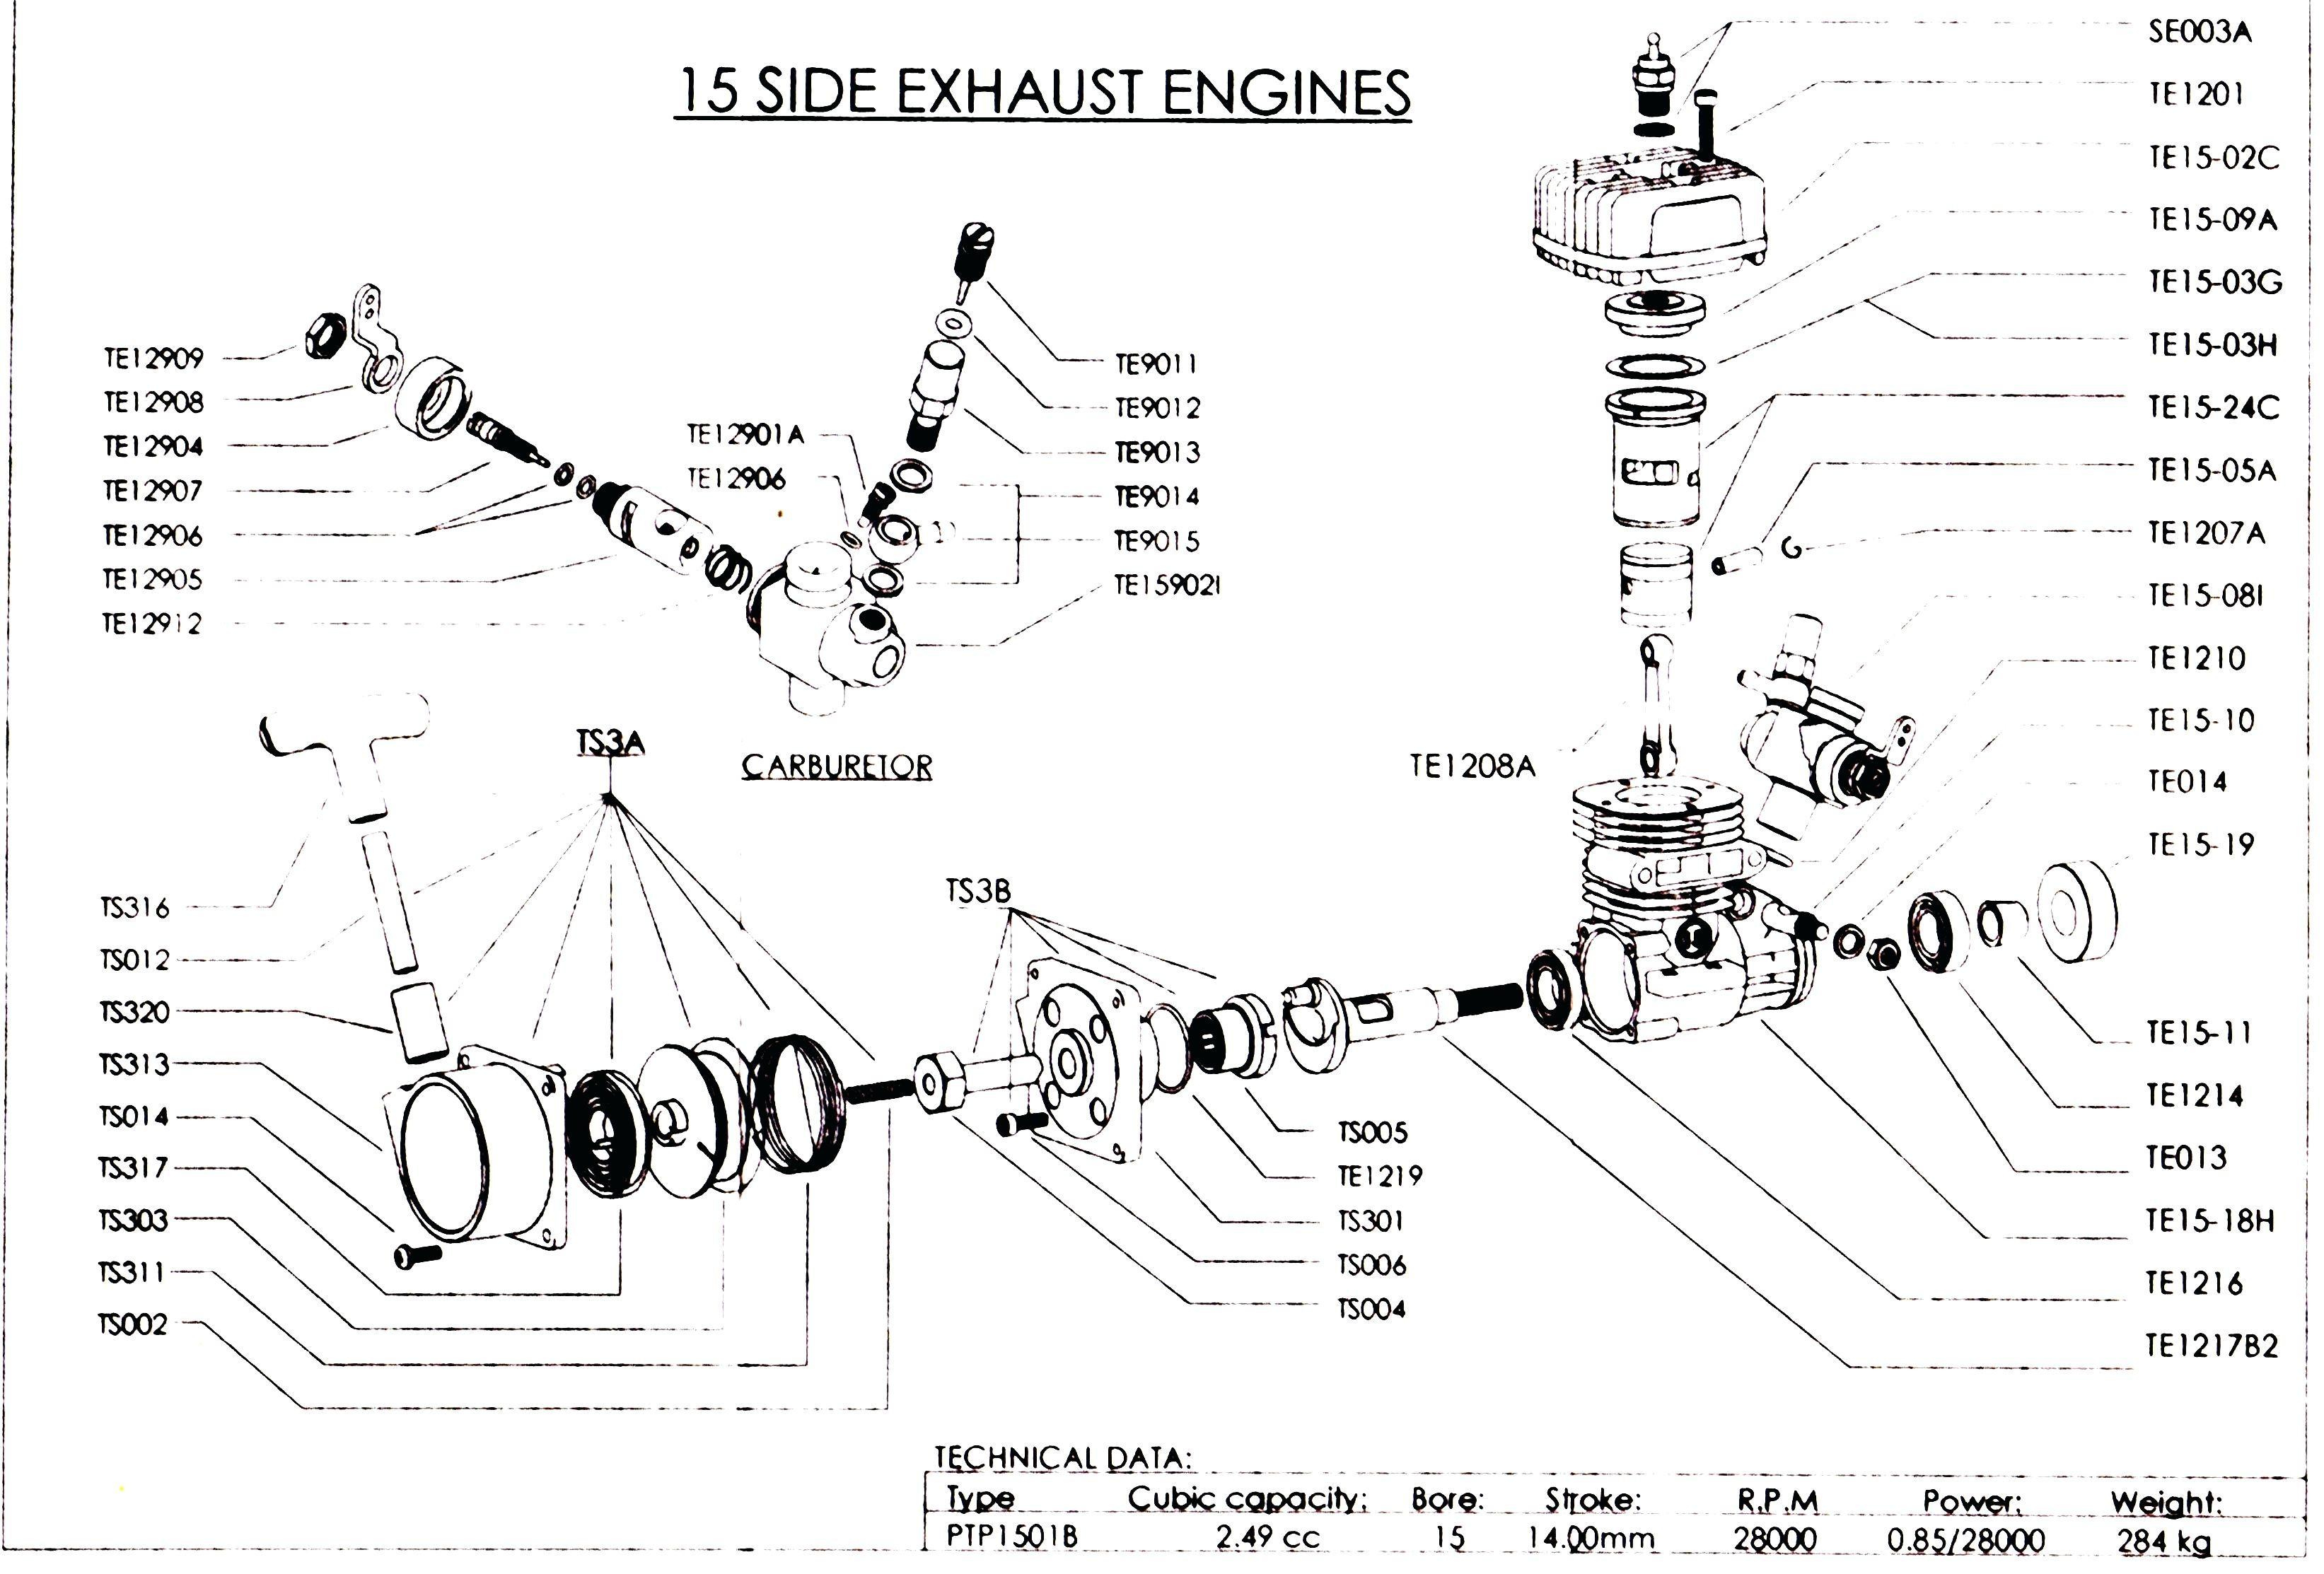 electric rc car diagram car diagram rc car diagram electric rc car rc car list car diagram rc car diagram electric rc car wiring diagramelectric